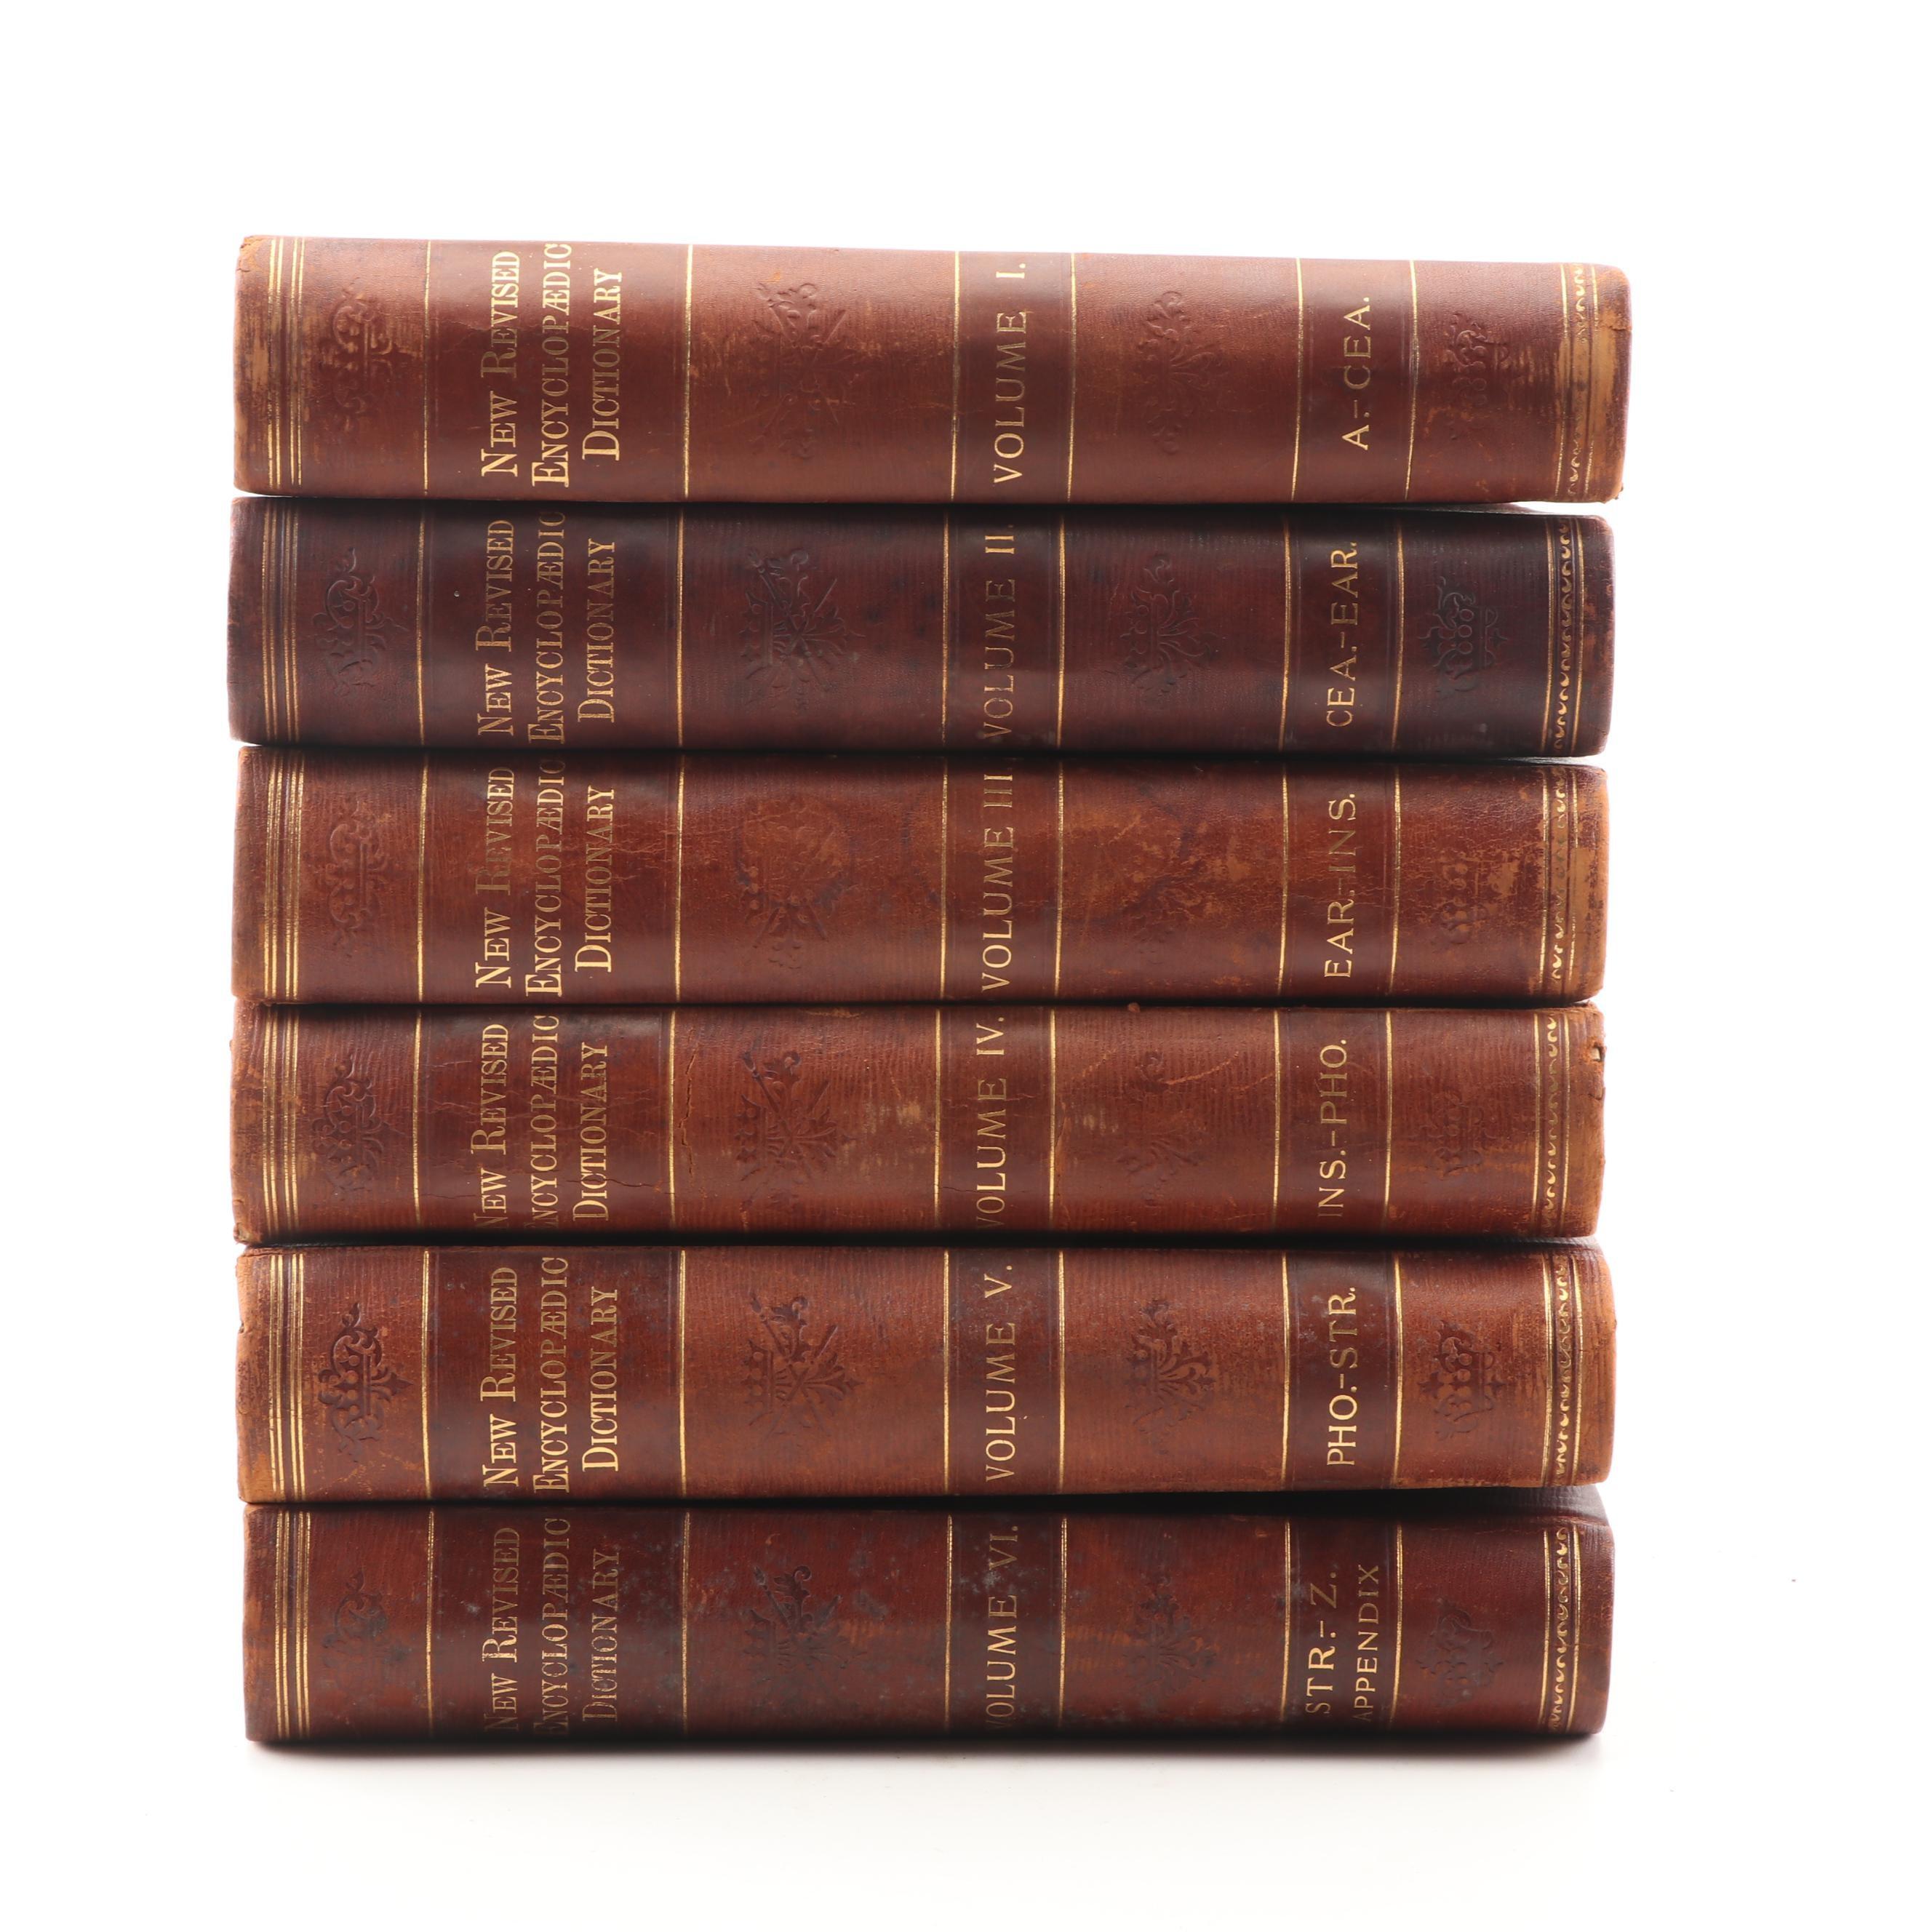 "Twentieth Century Edition ""Encyclopædic Dictionary"" ed. Robert Hunter, 1900"